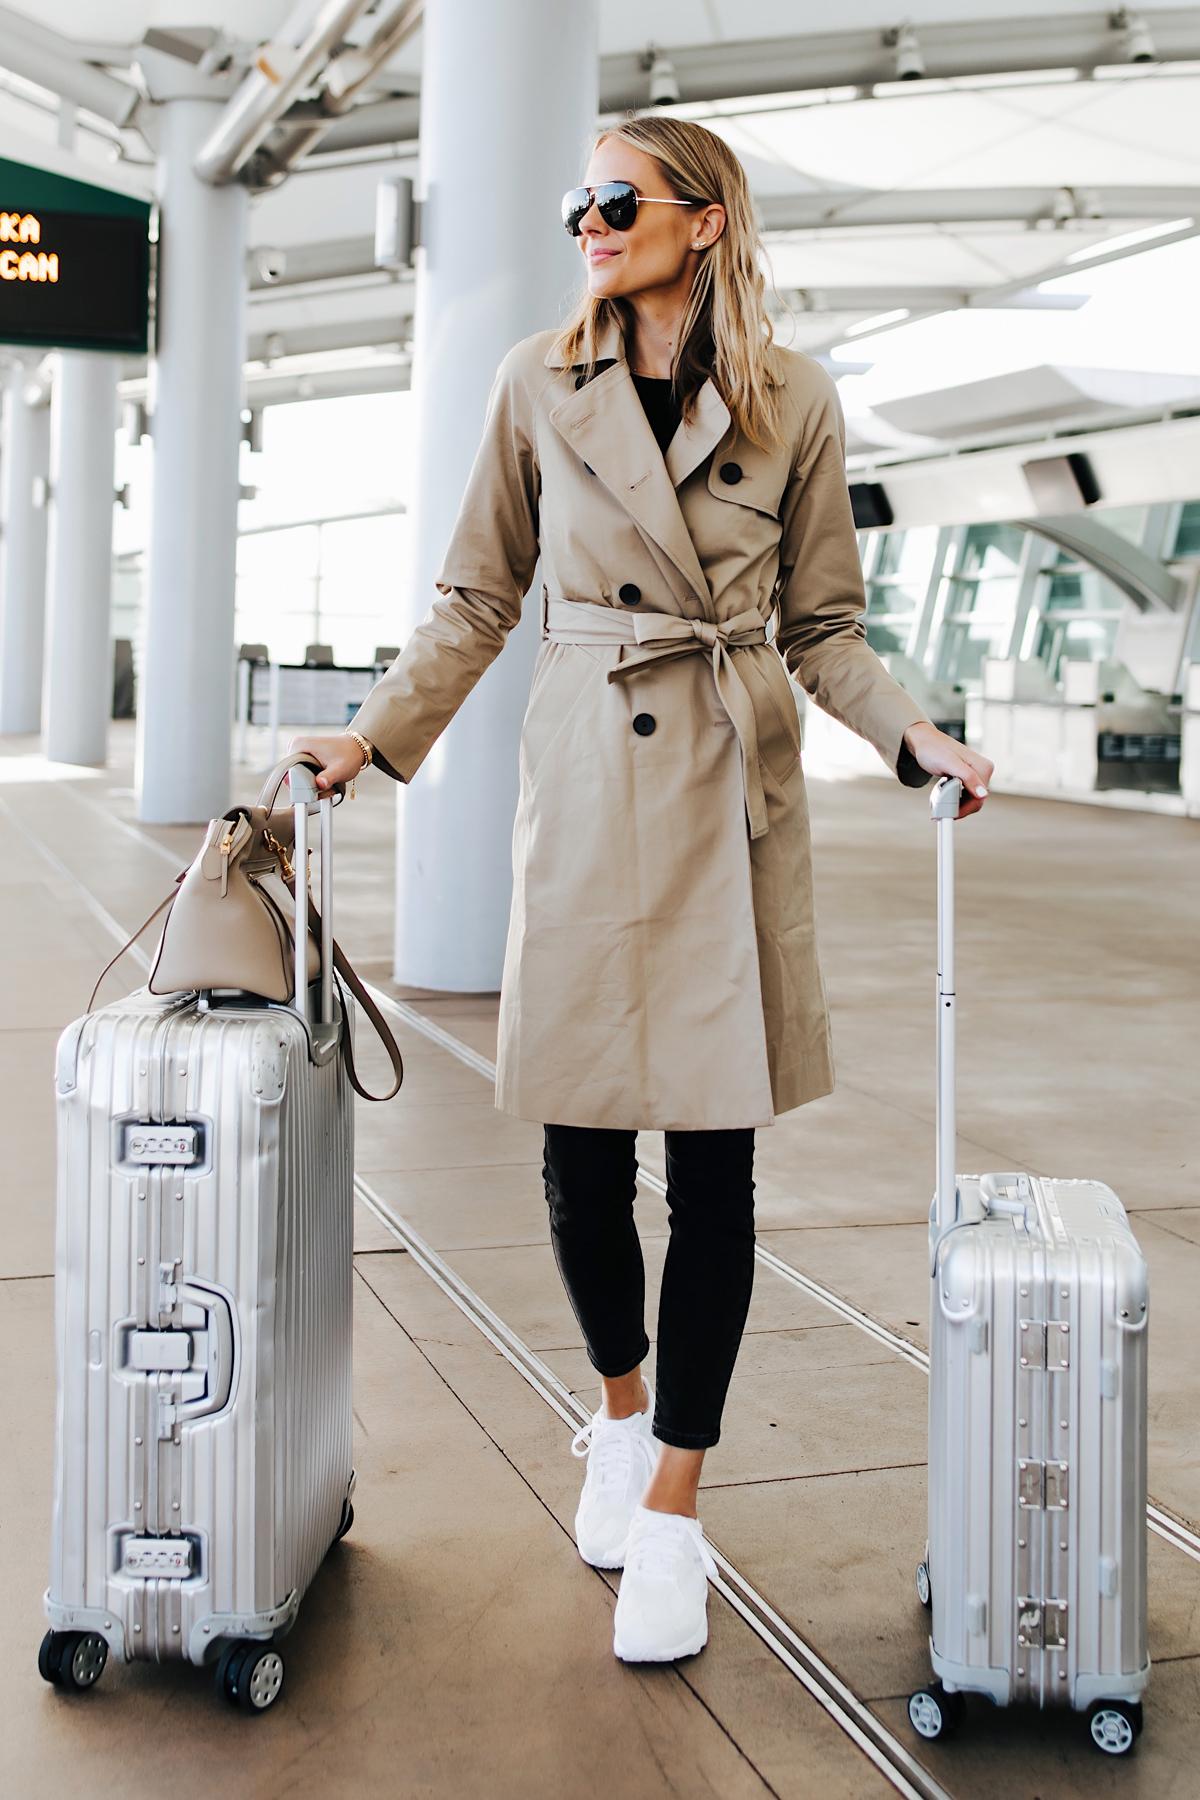 Blonde Woman Wearing Airport Travel Outfit Trench Coat Black Skinny Jeans Reebok Aztrek White Sneakers Rimowa Luggage Fashion Jackson San Diego Fashion Blogger Street Style